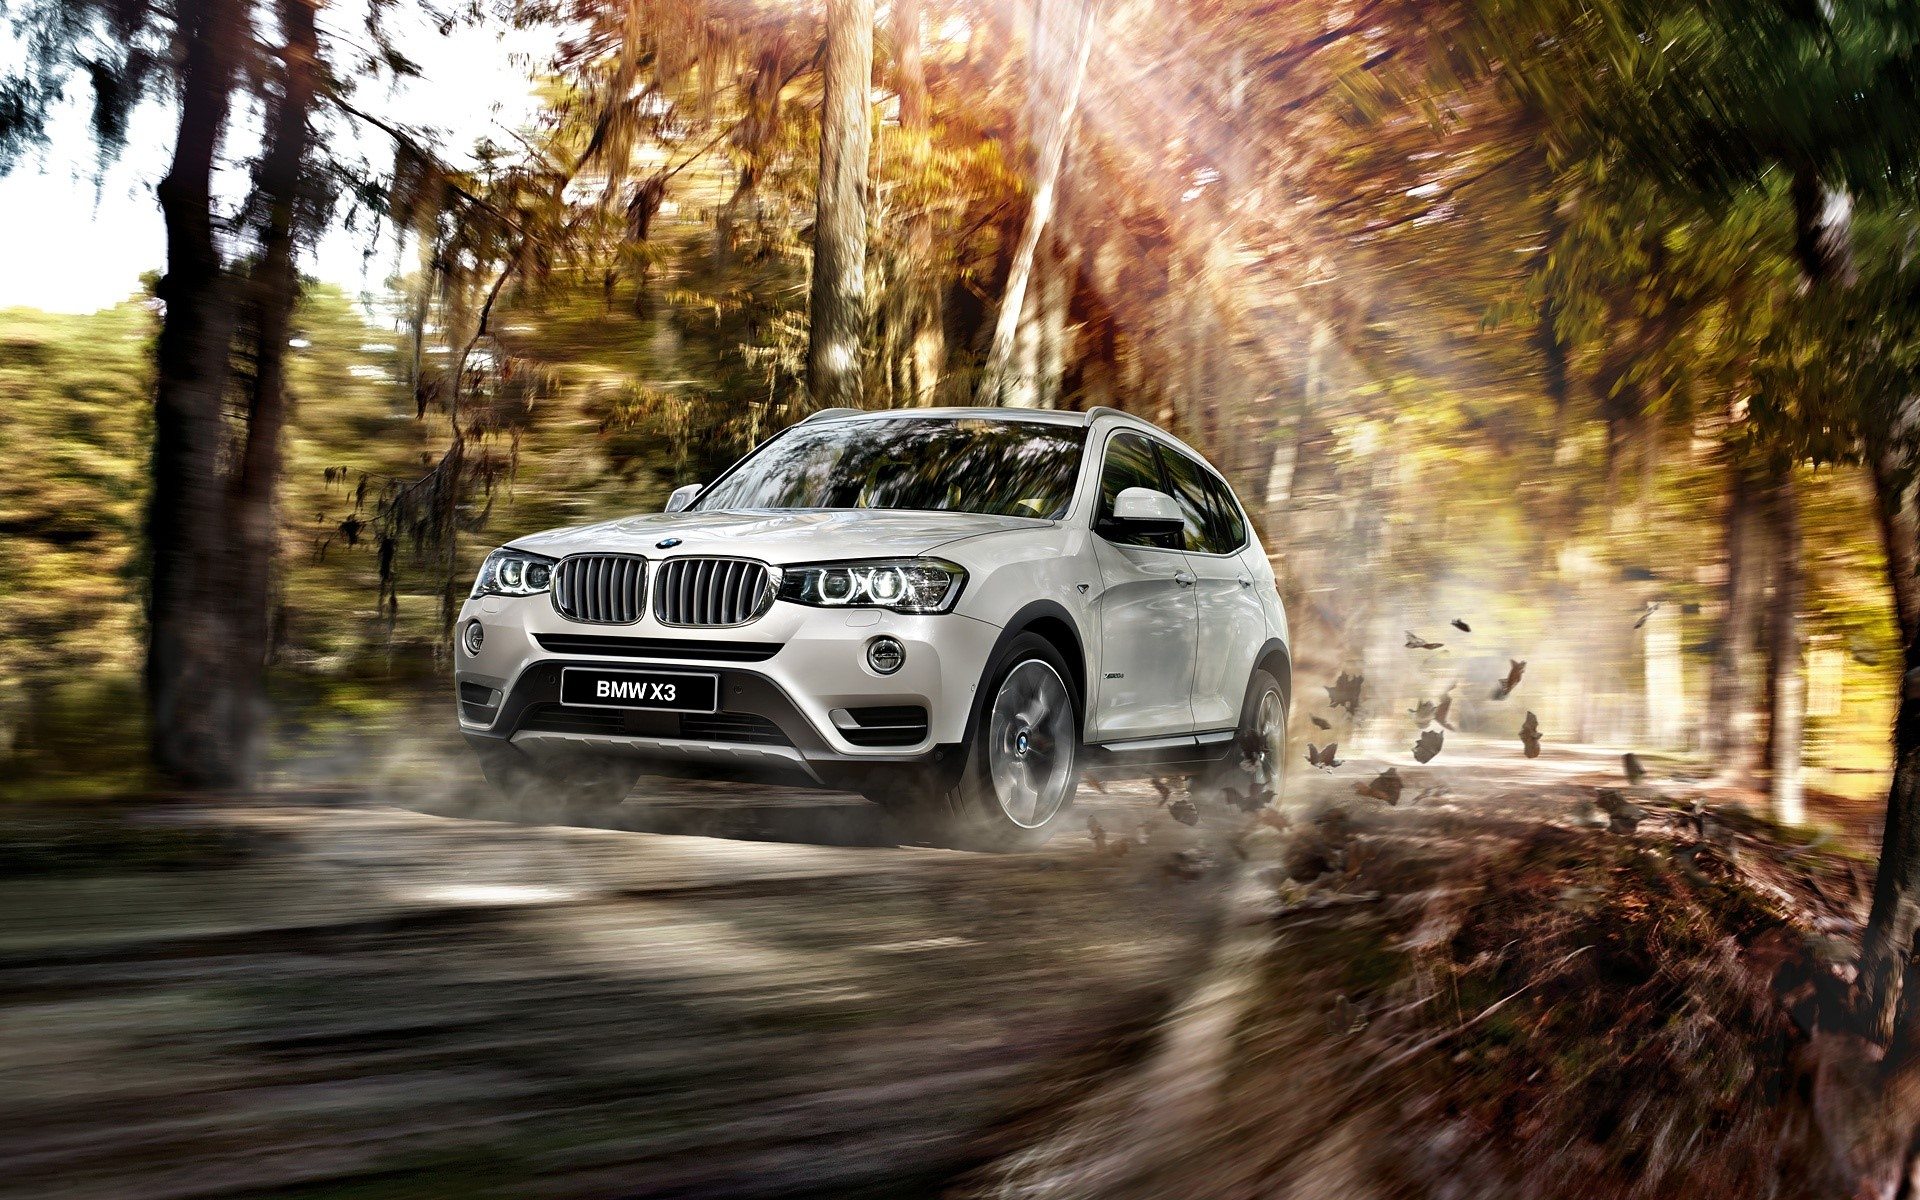 Fondo de pantalla de BMW X3 F25 Imágenes